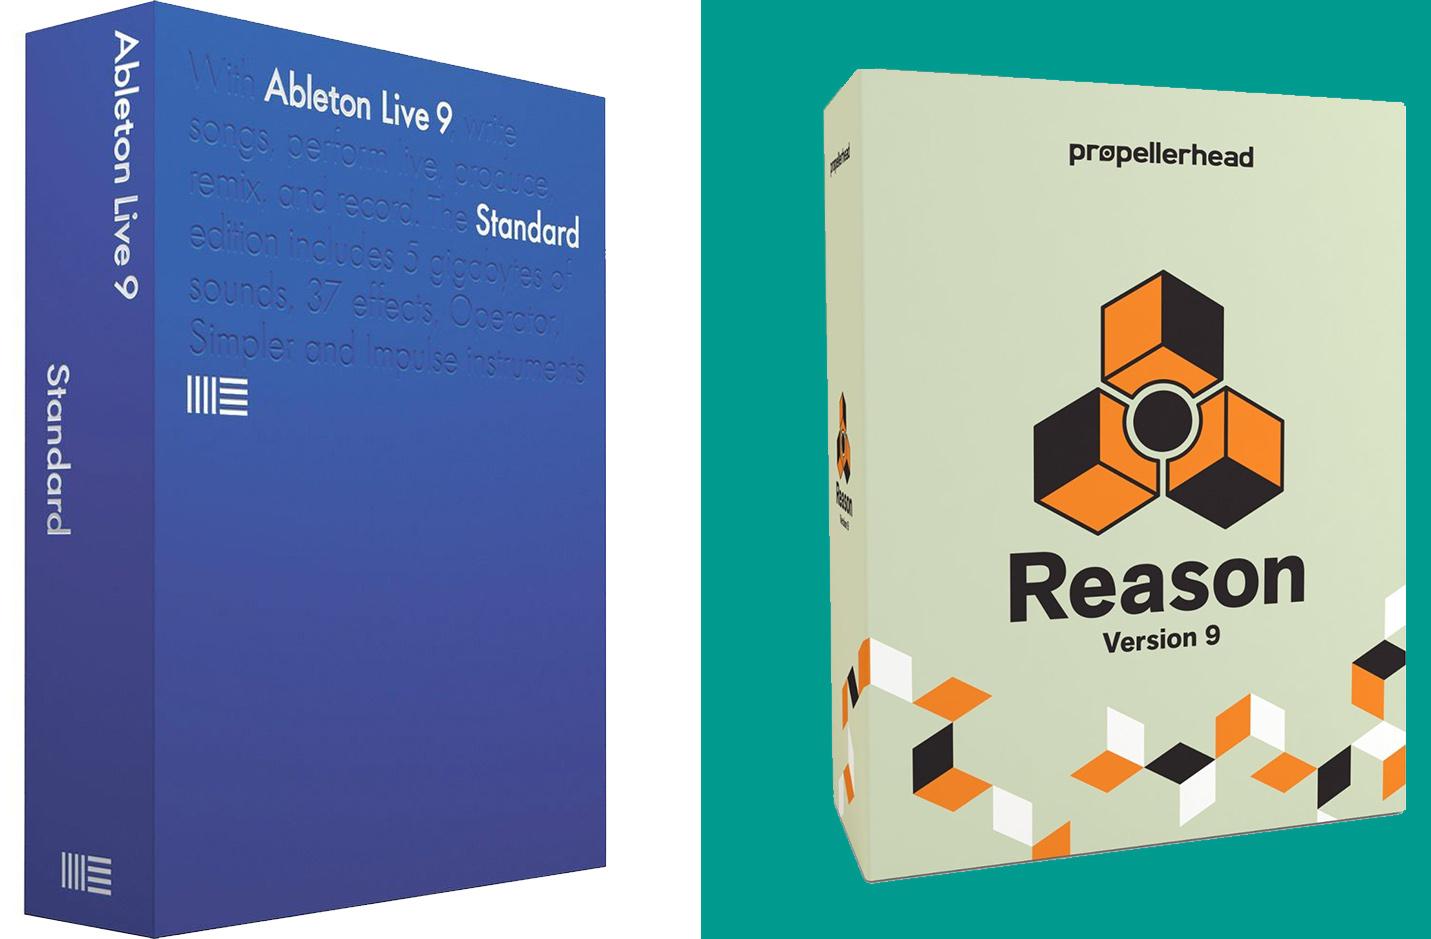 Ableton Live 9 Versus Reason 9